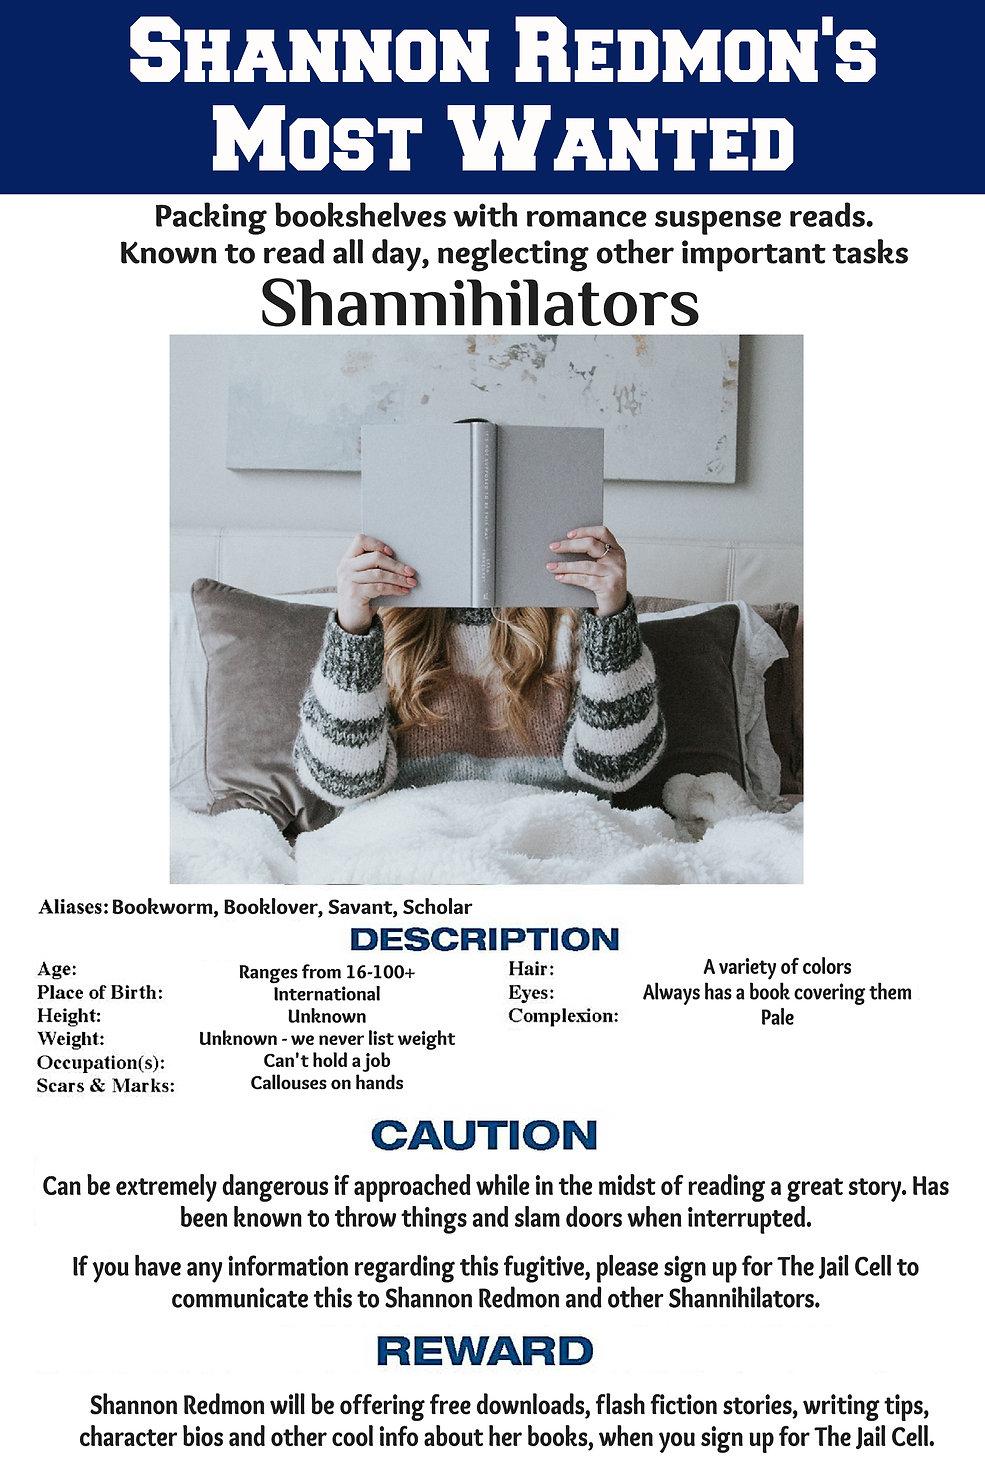 Wanted Shannihilators.jpg